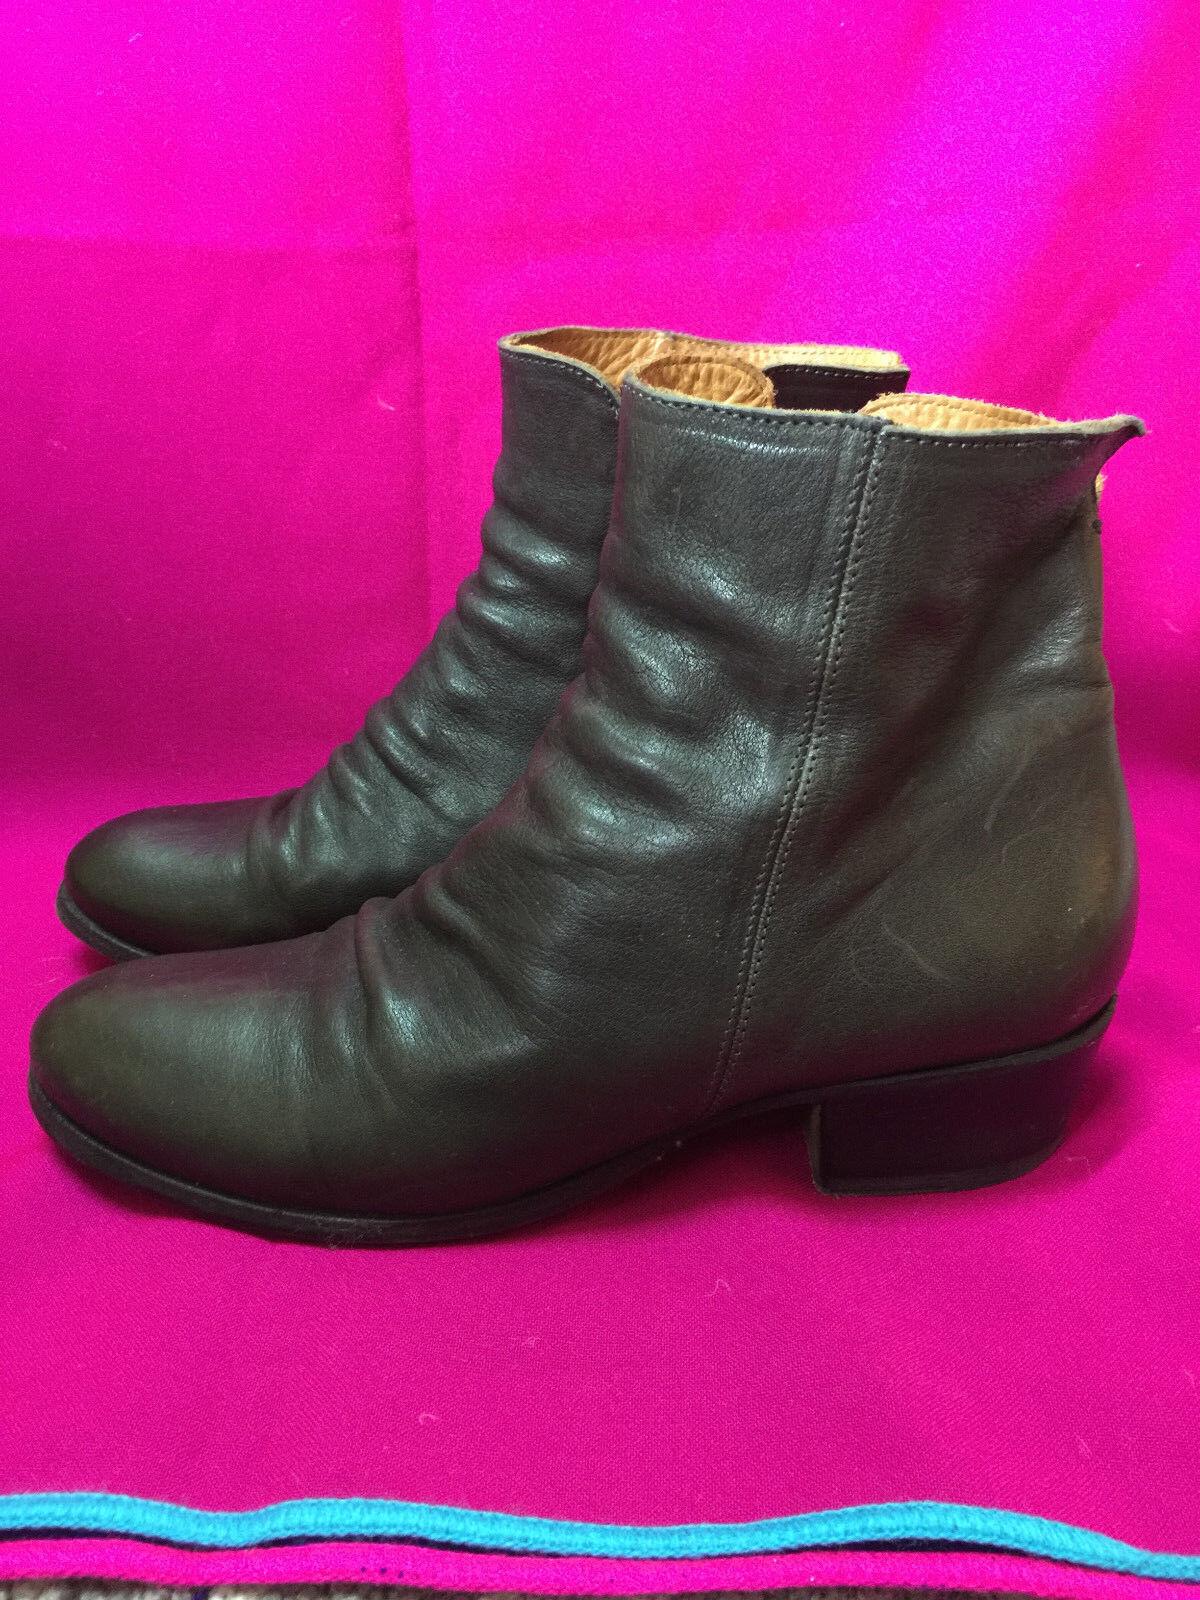 Fiorentini + Baker Ankle Boot sz. EU38.5